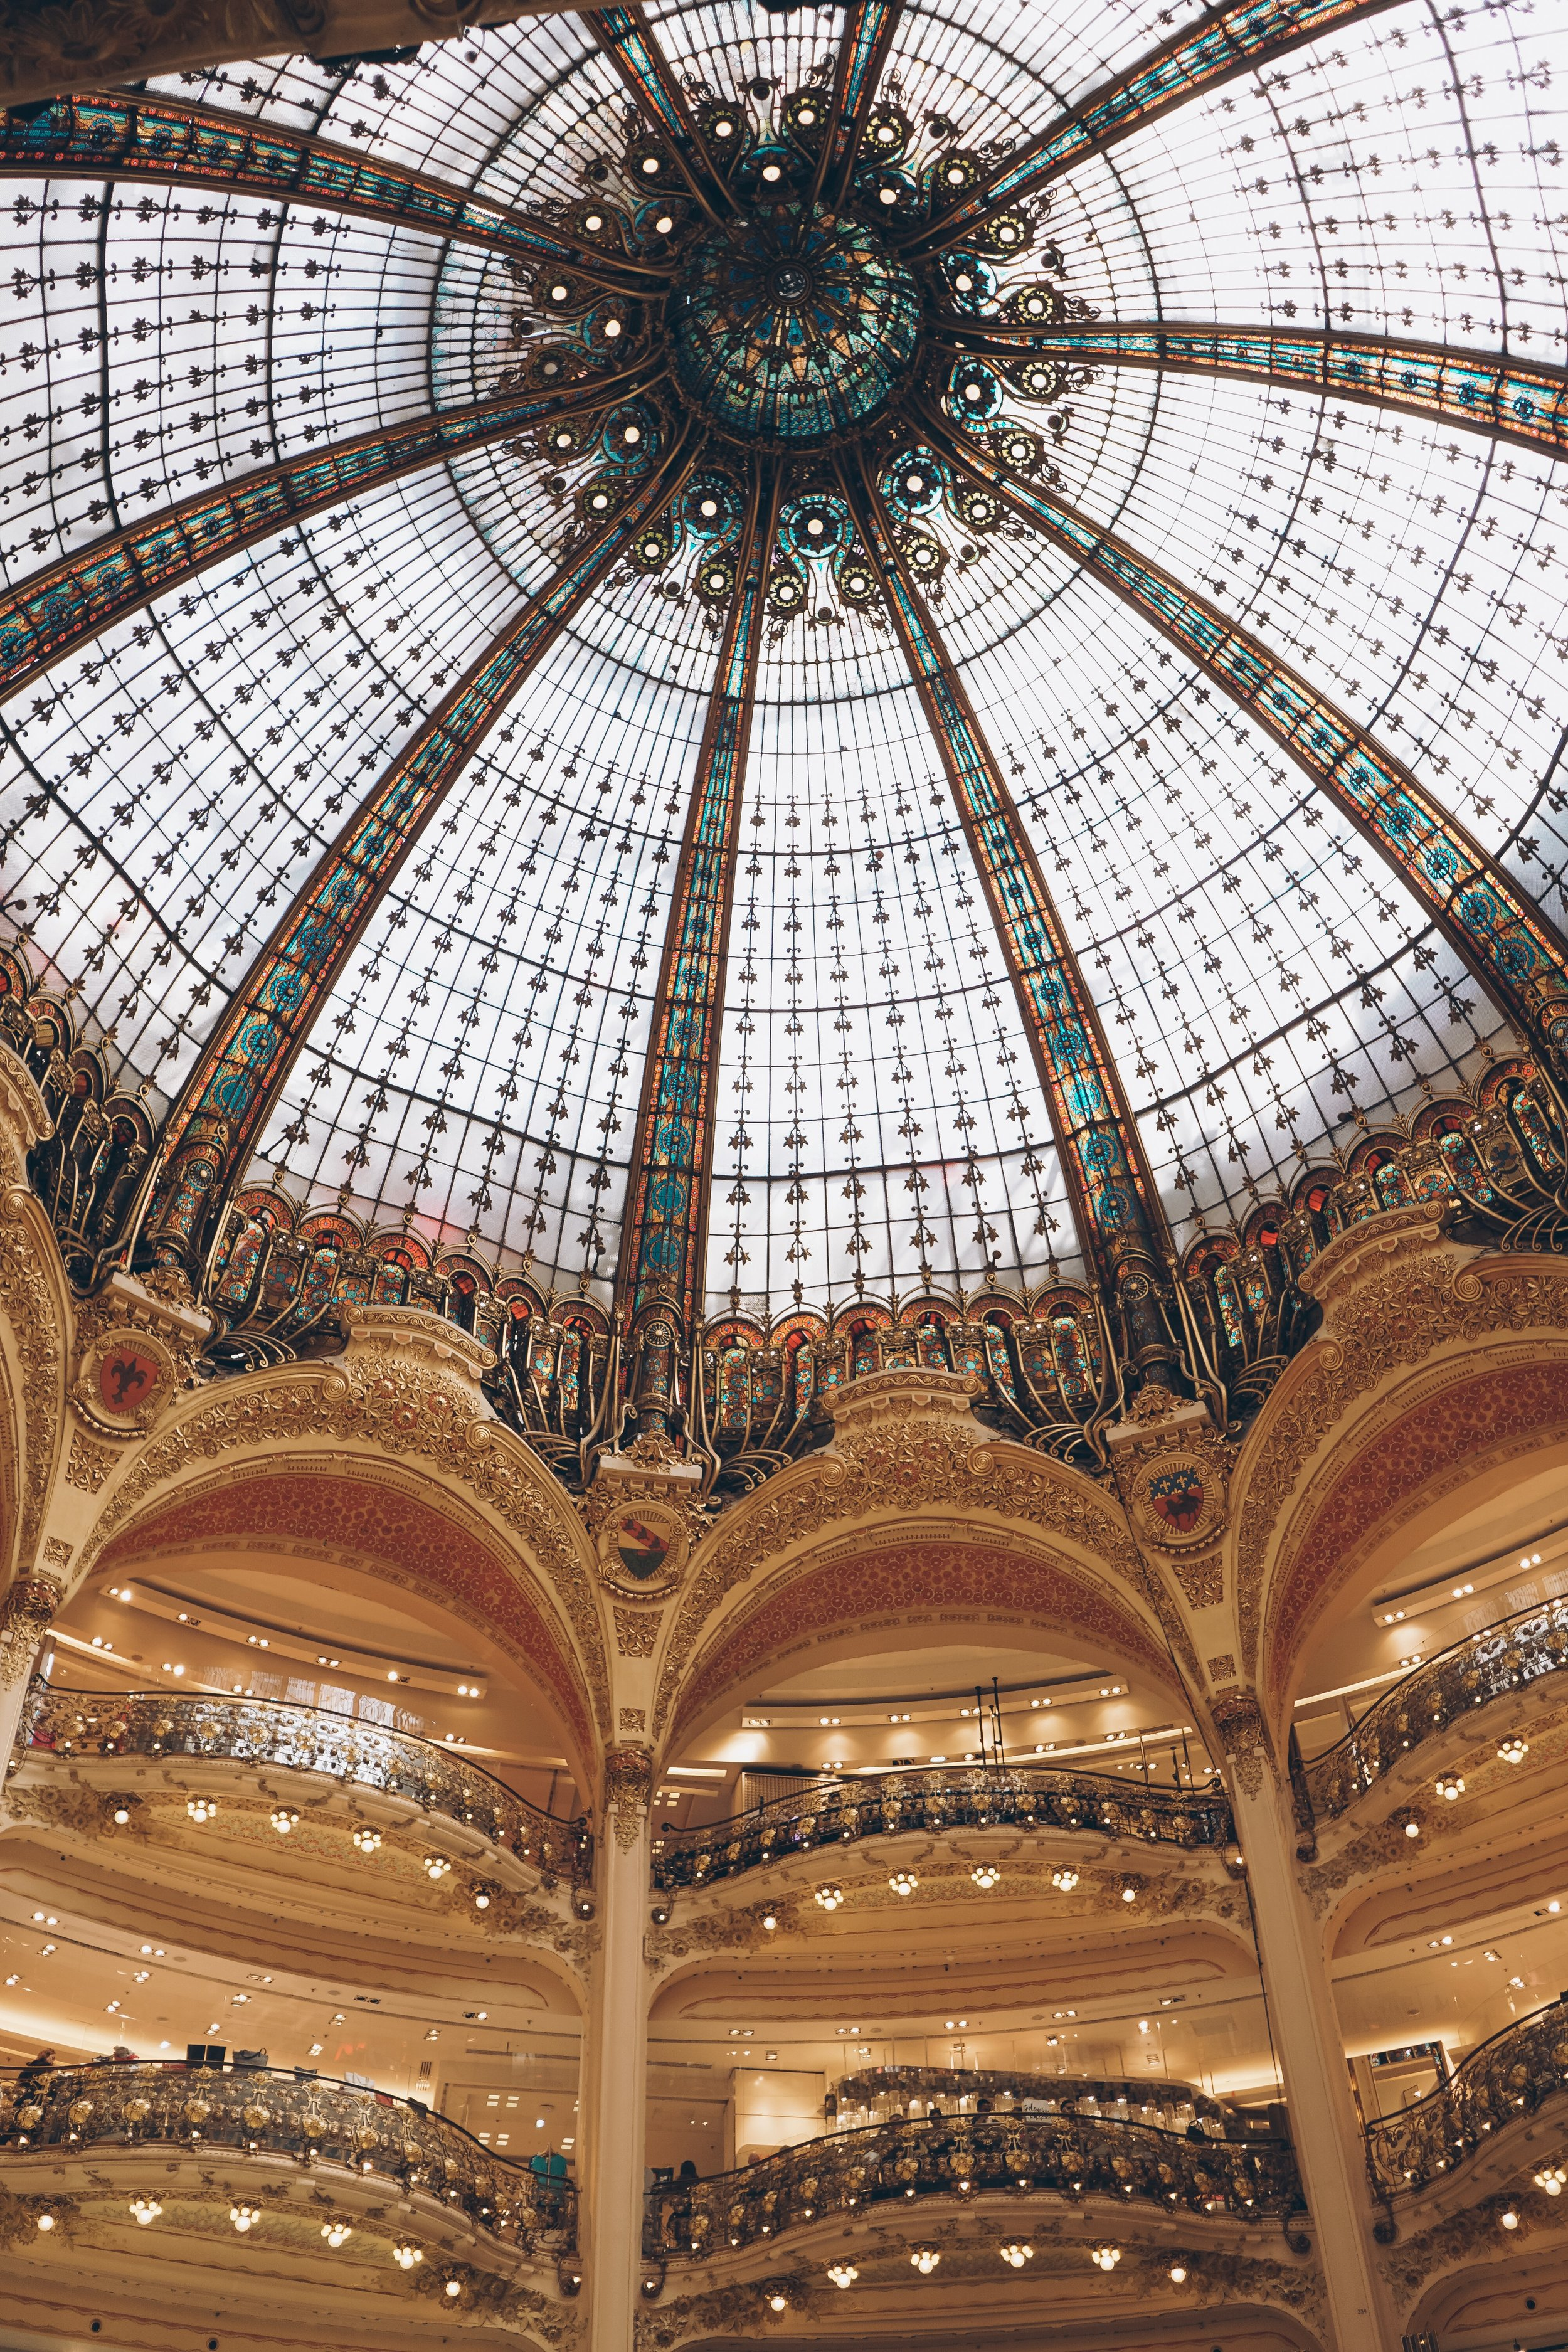 Julia friedman paris for the weekend sony alpha Galeries Lafayette